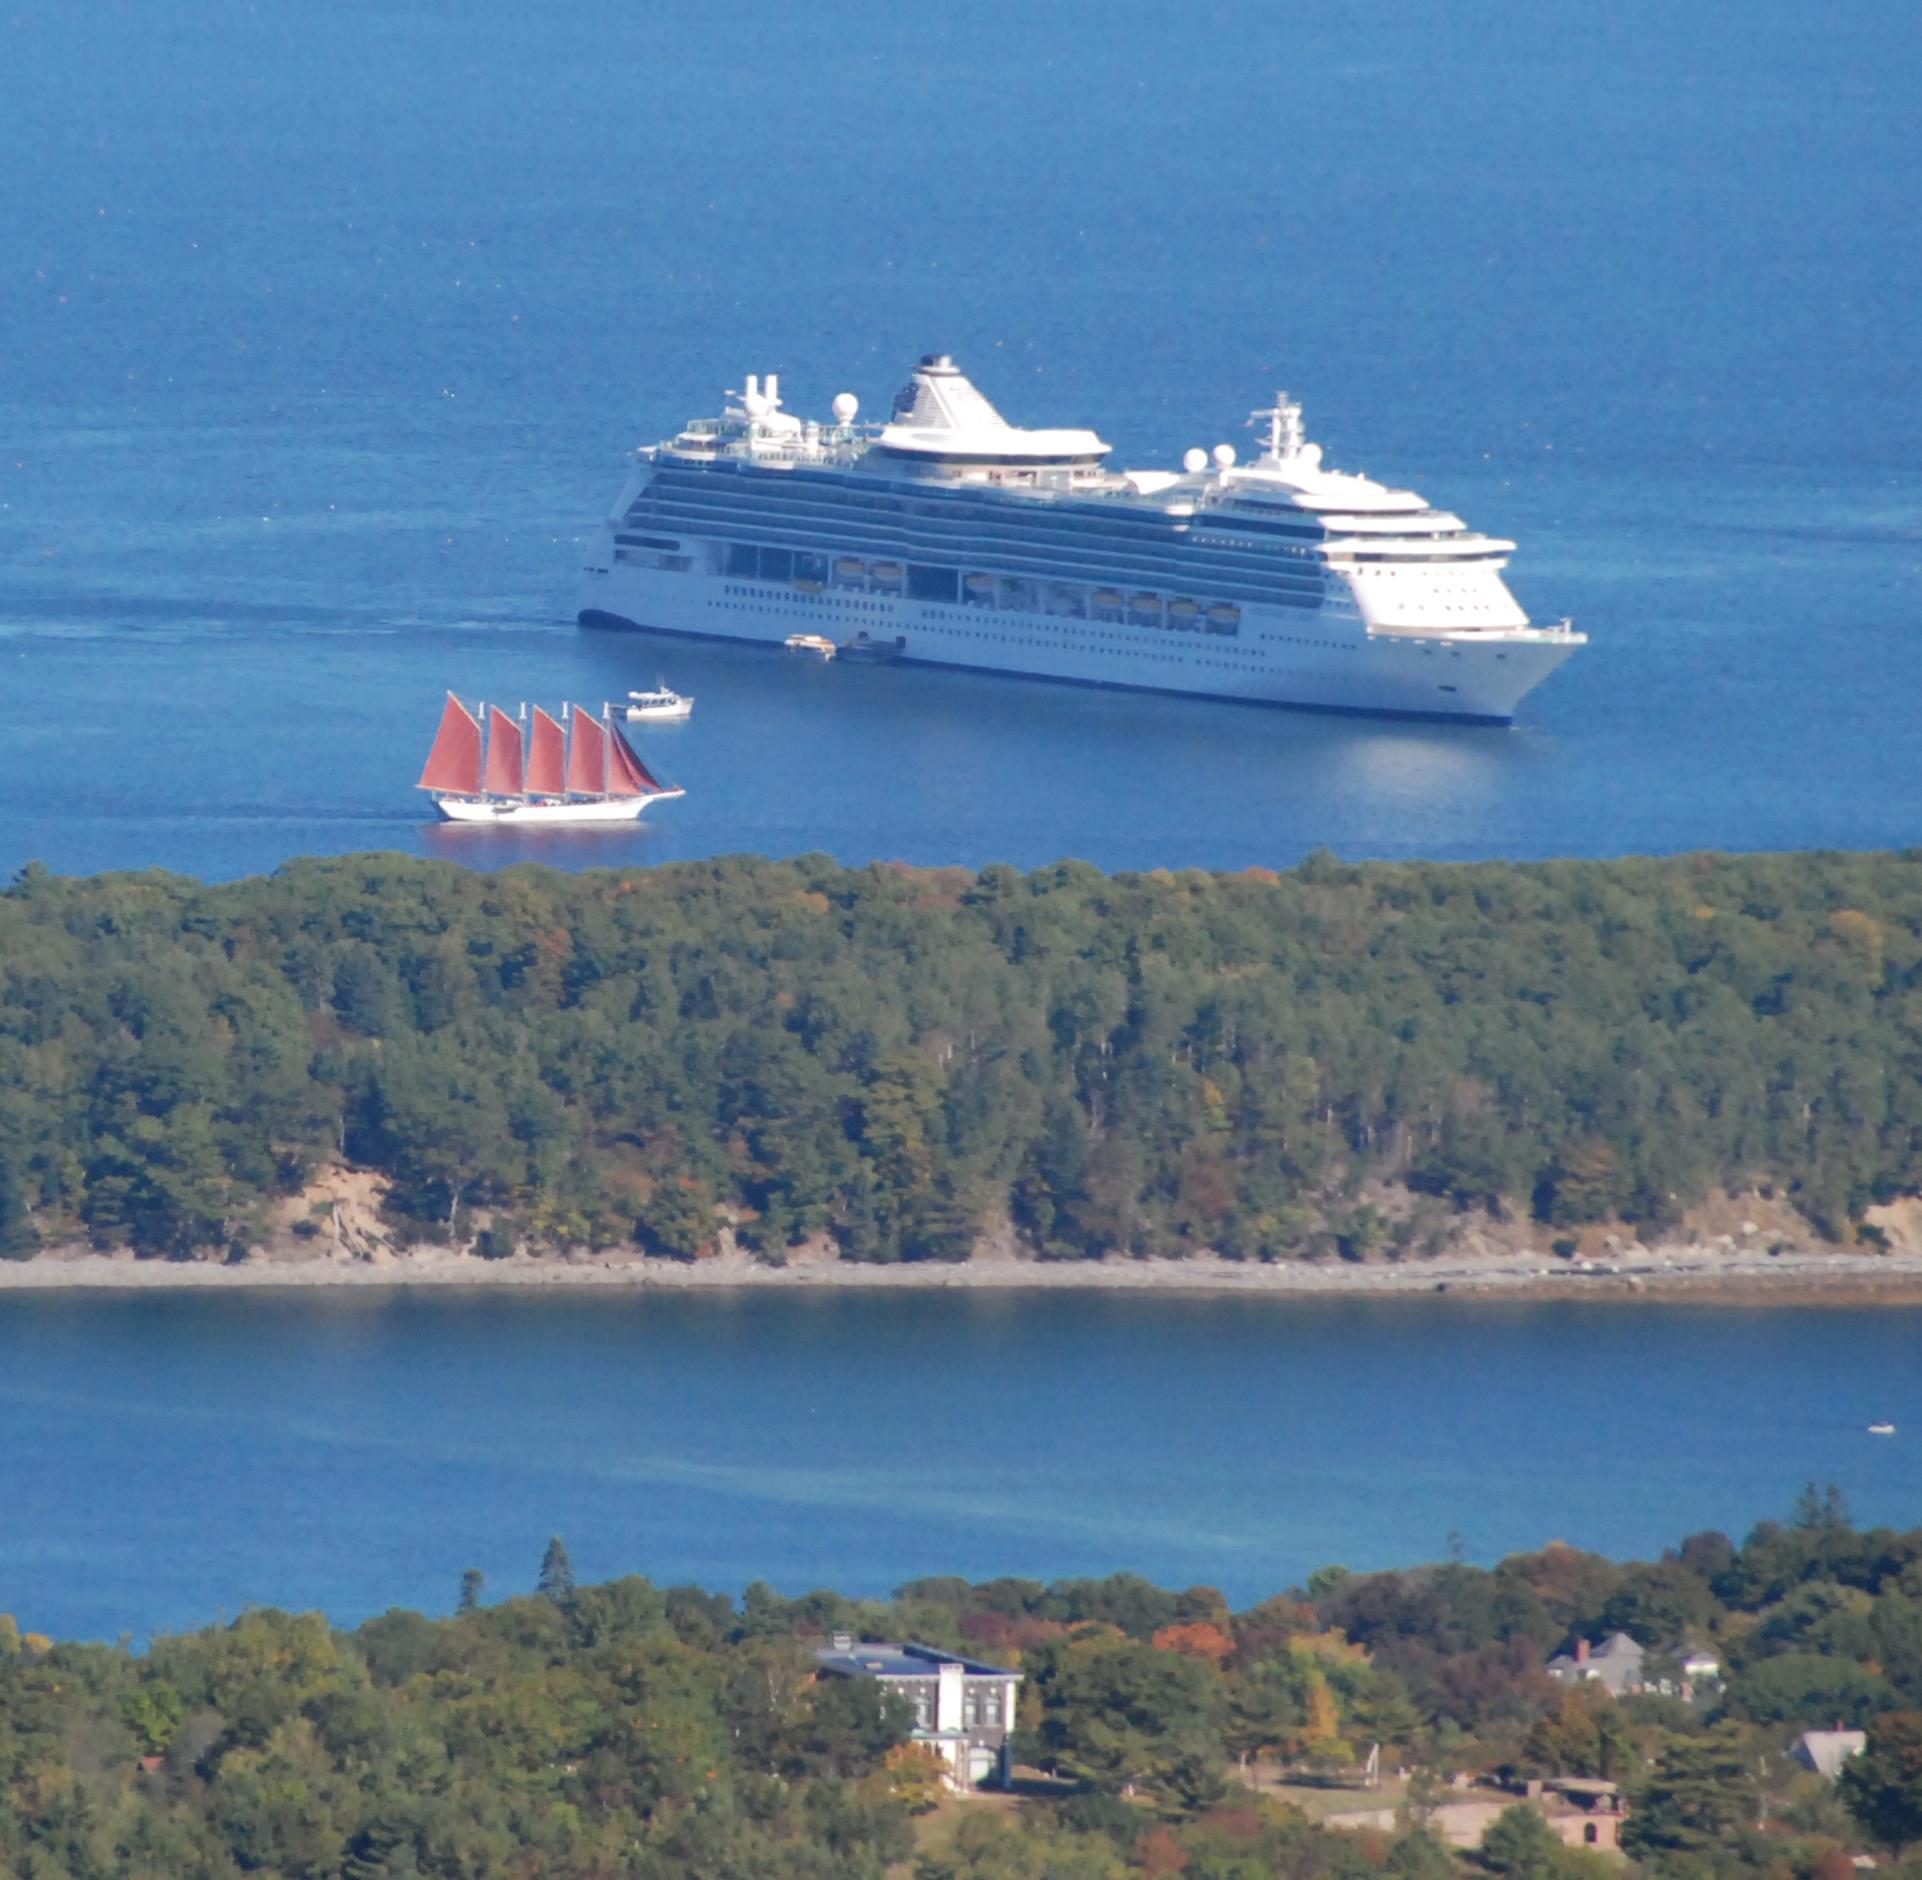 FileThreeshipsbarharbormainejpg Wikimedia Commons - Cruise ship bar harbor